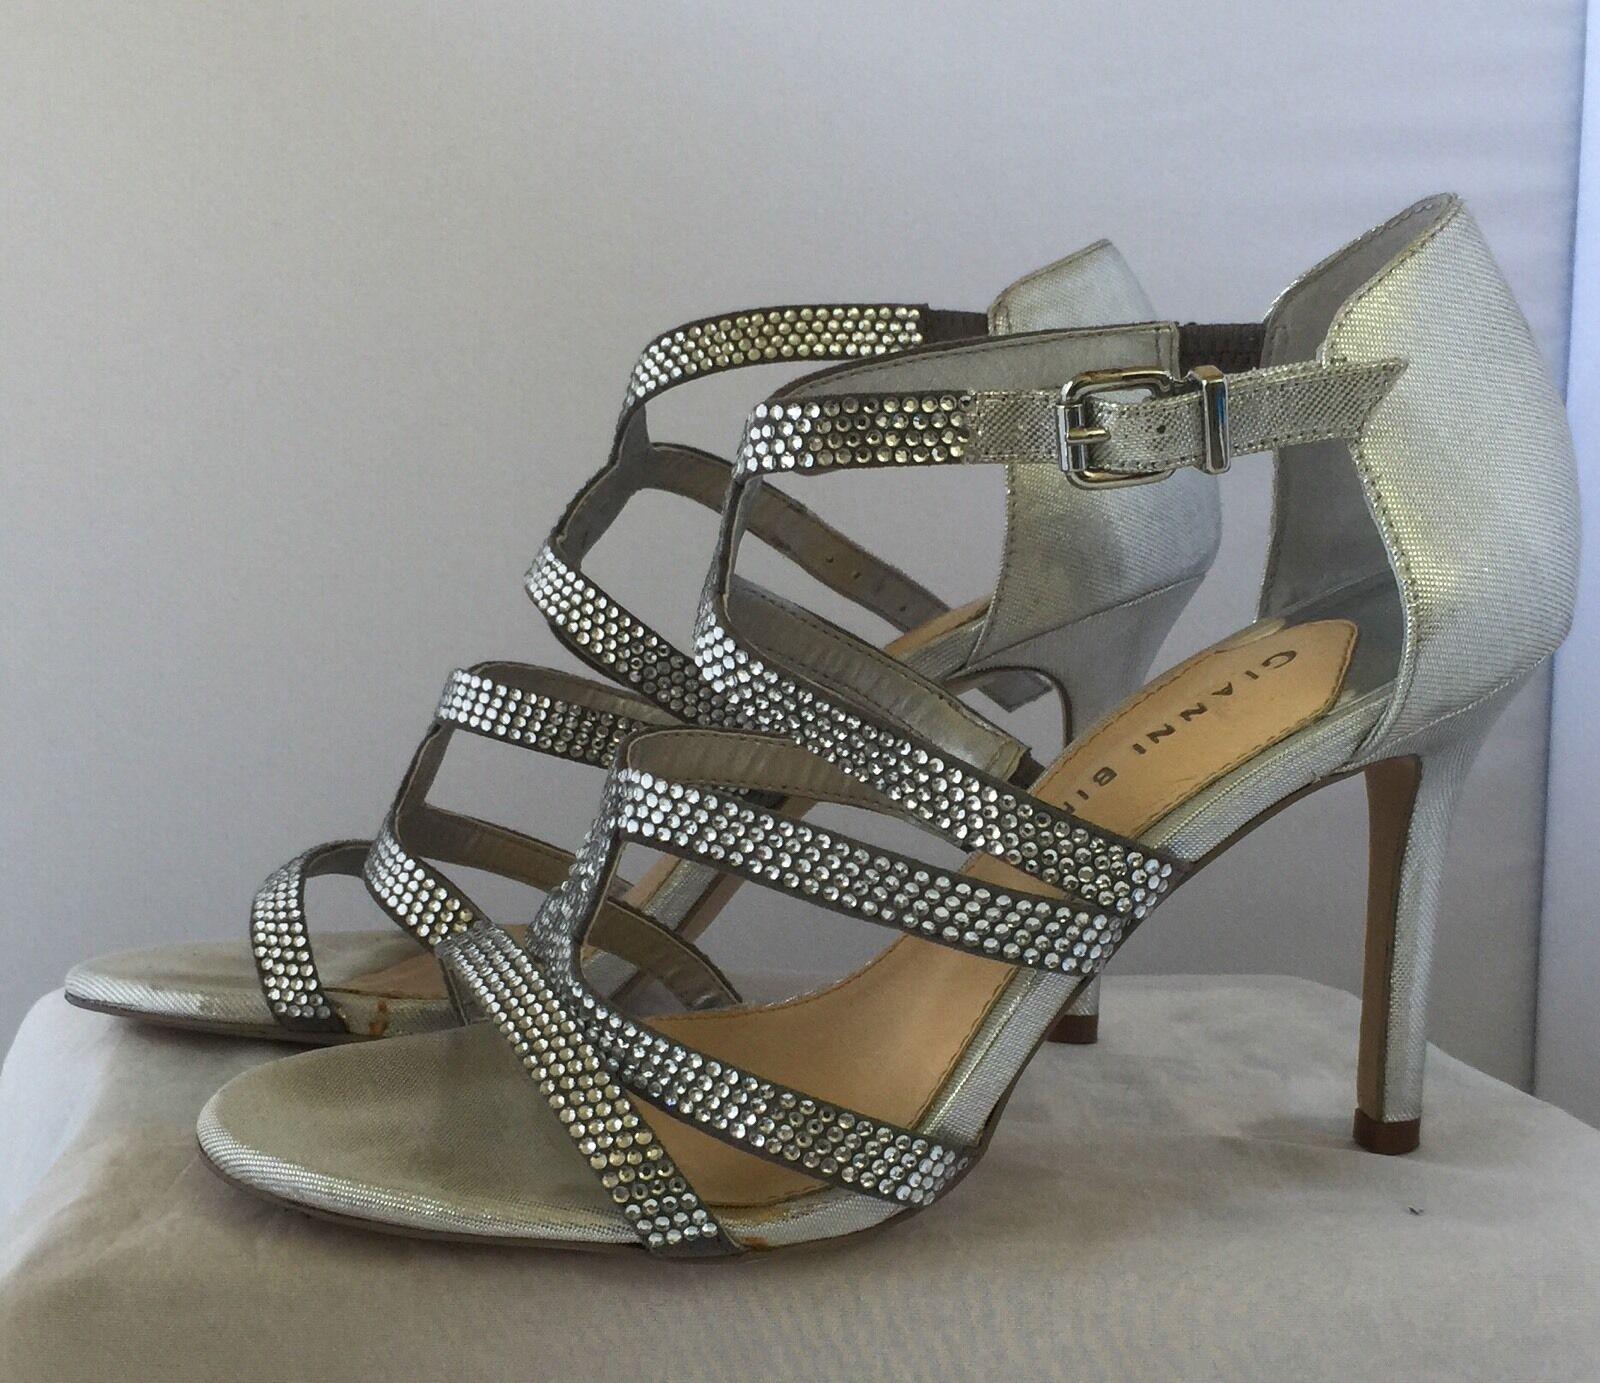 Gianni Bini Women Shoes Silver Rhinestones Leather Sz8M Sole Dress Sandal Heels Sz8M Leather f3320e